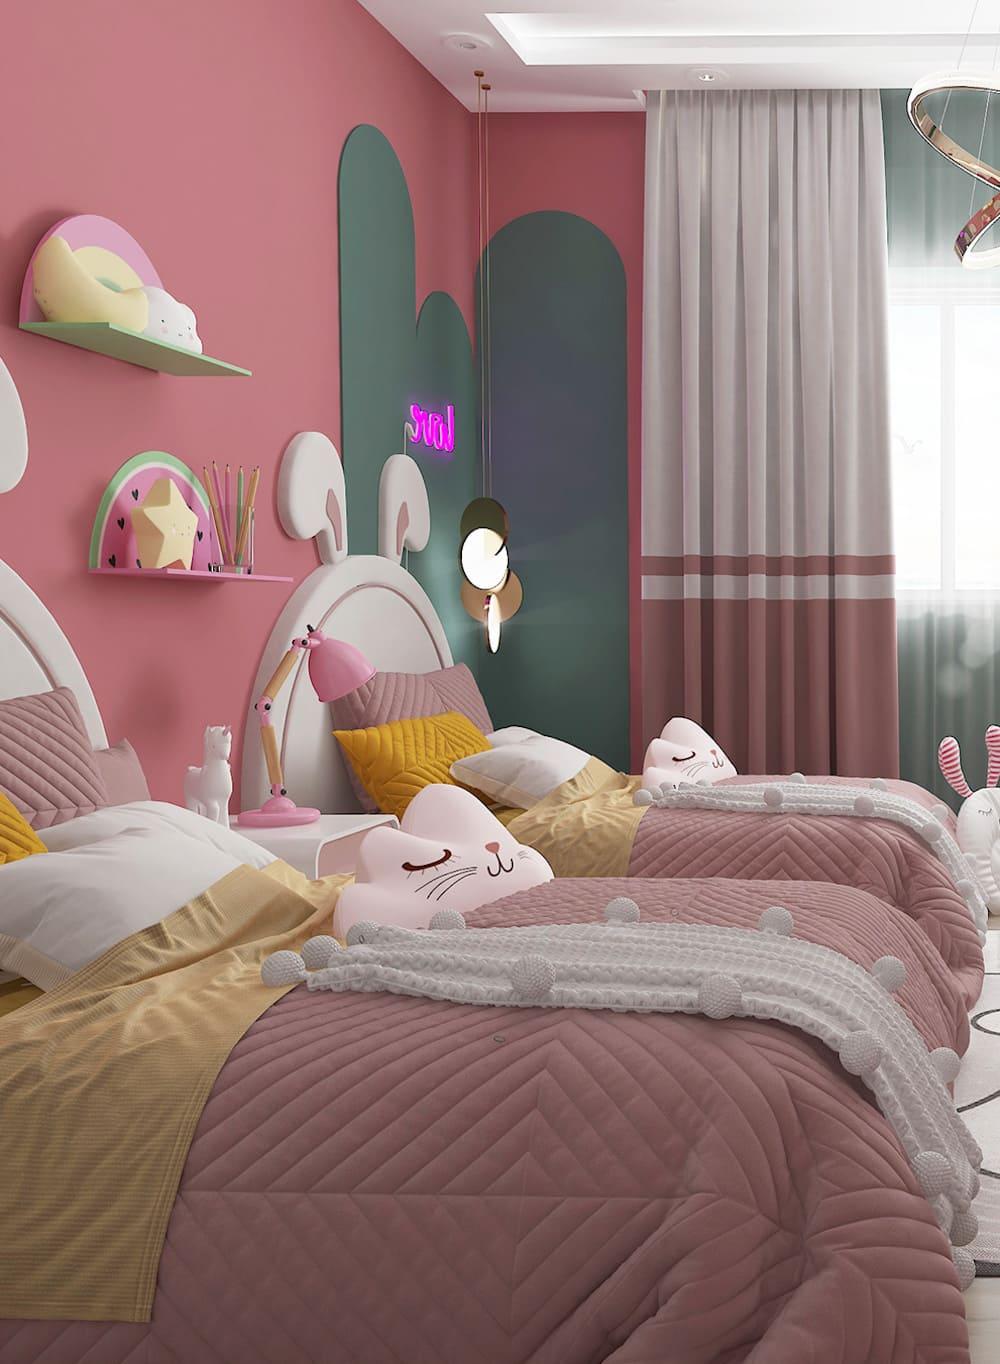 интерьер детской комнаты фото 27